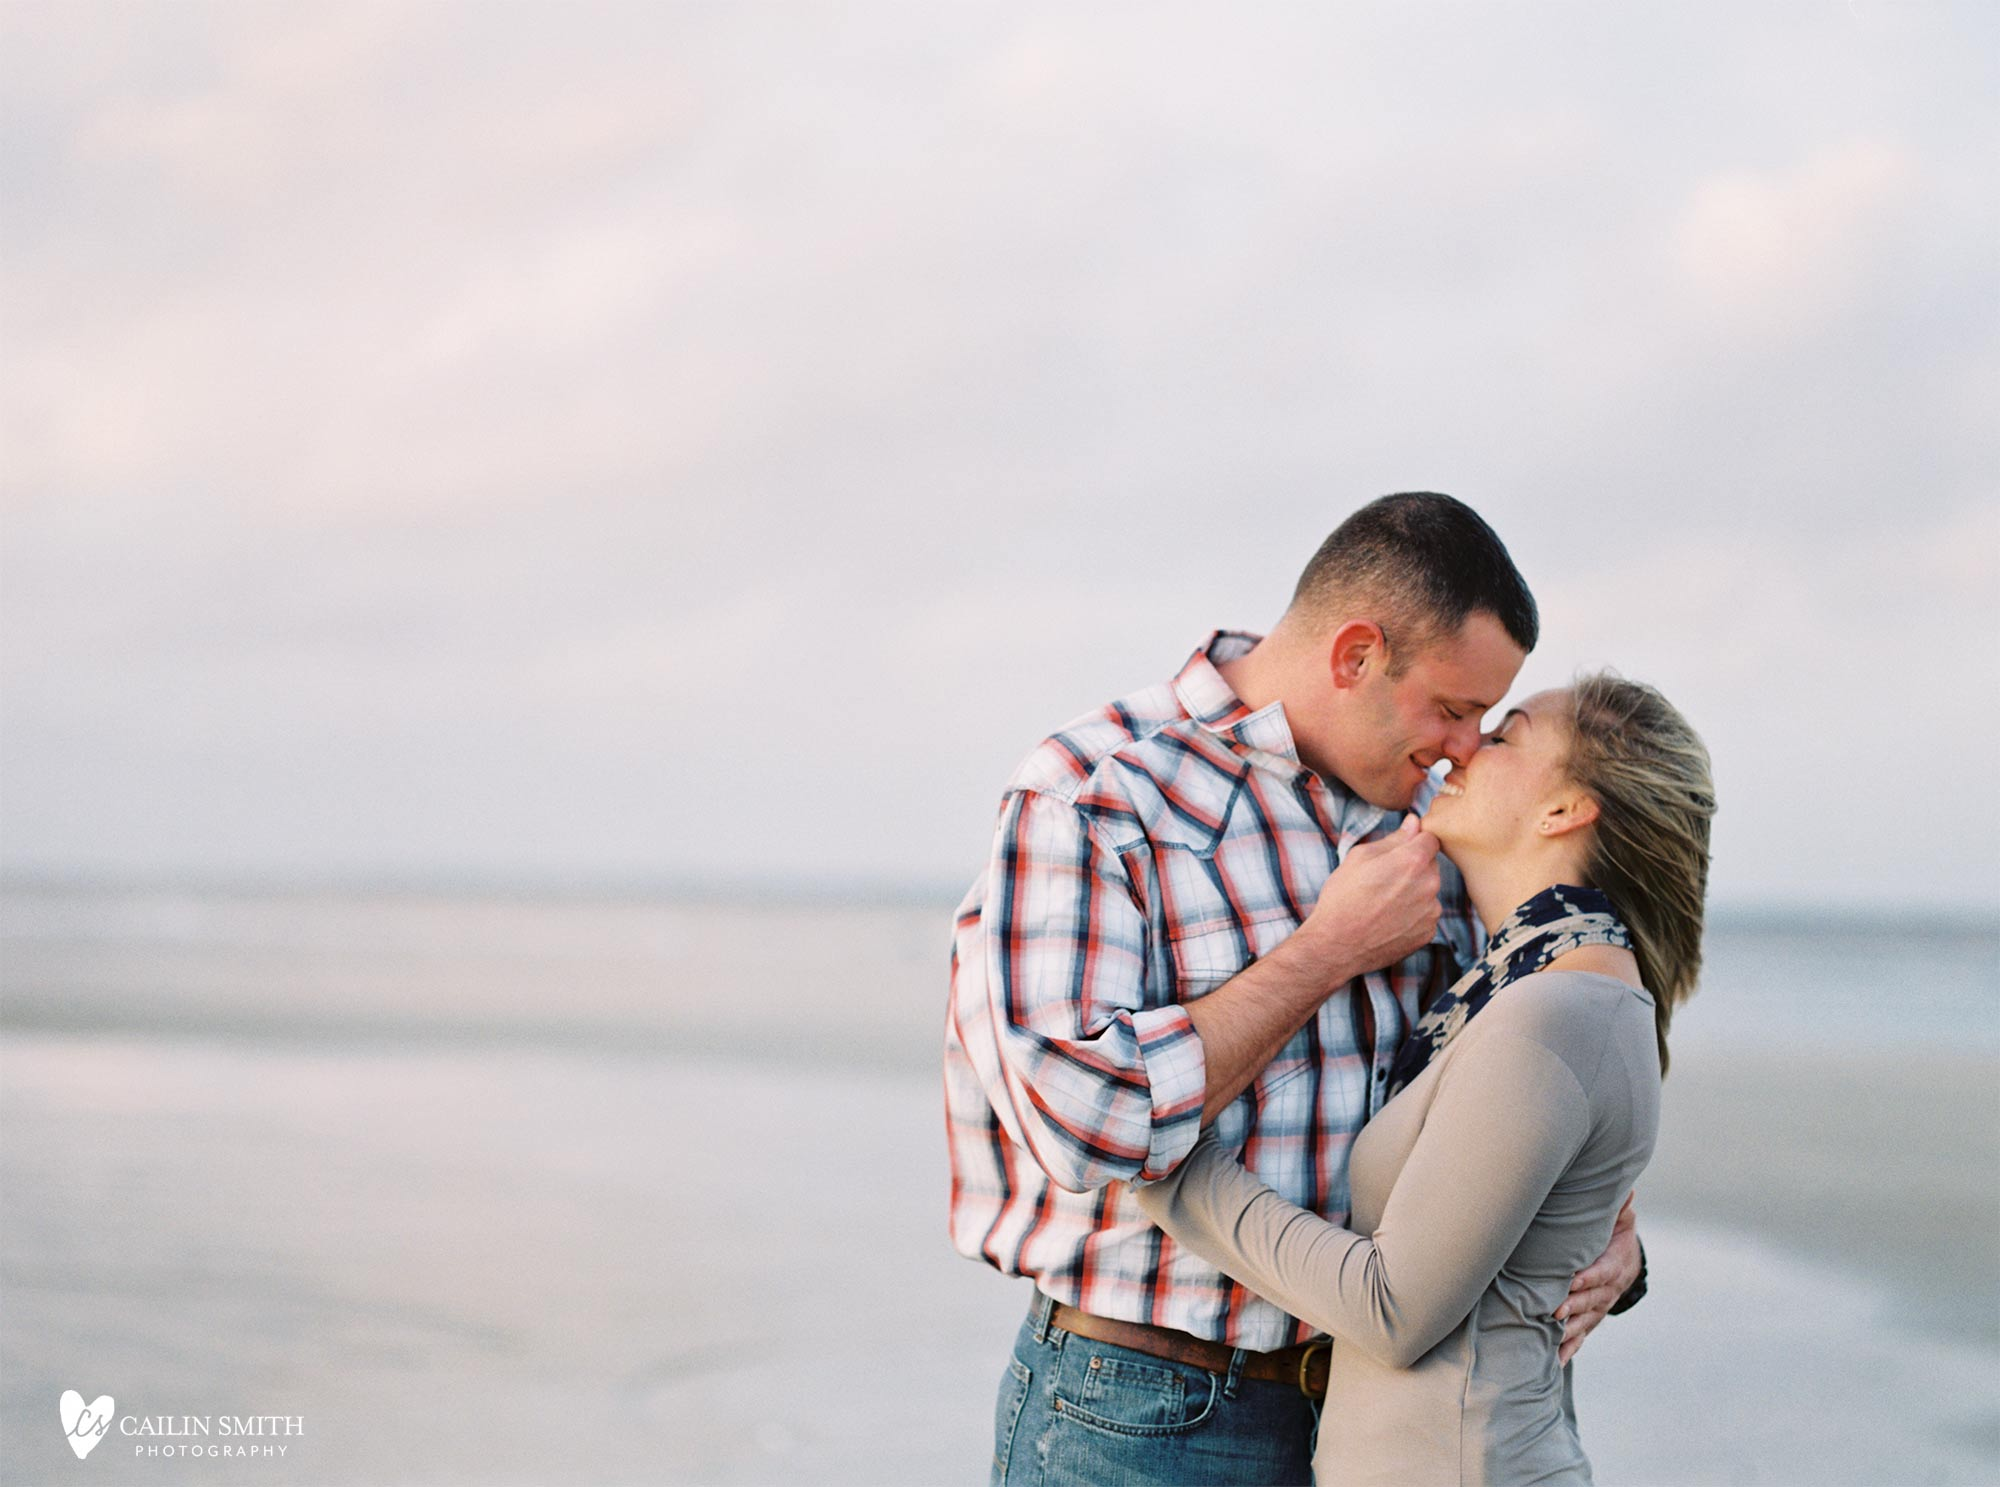 Sarah_Justin_Saint_Simons_Island_Engagement_Photography_007.jpg